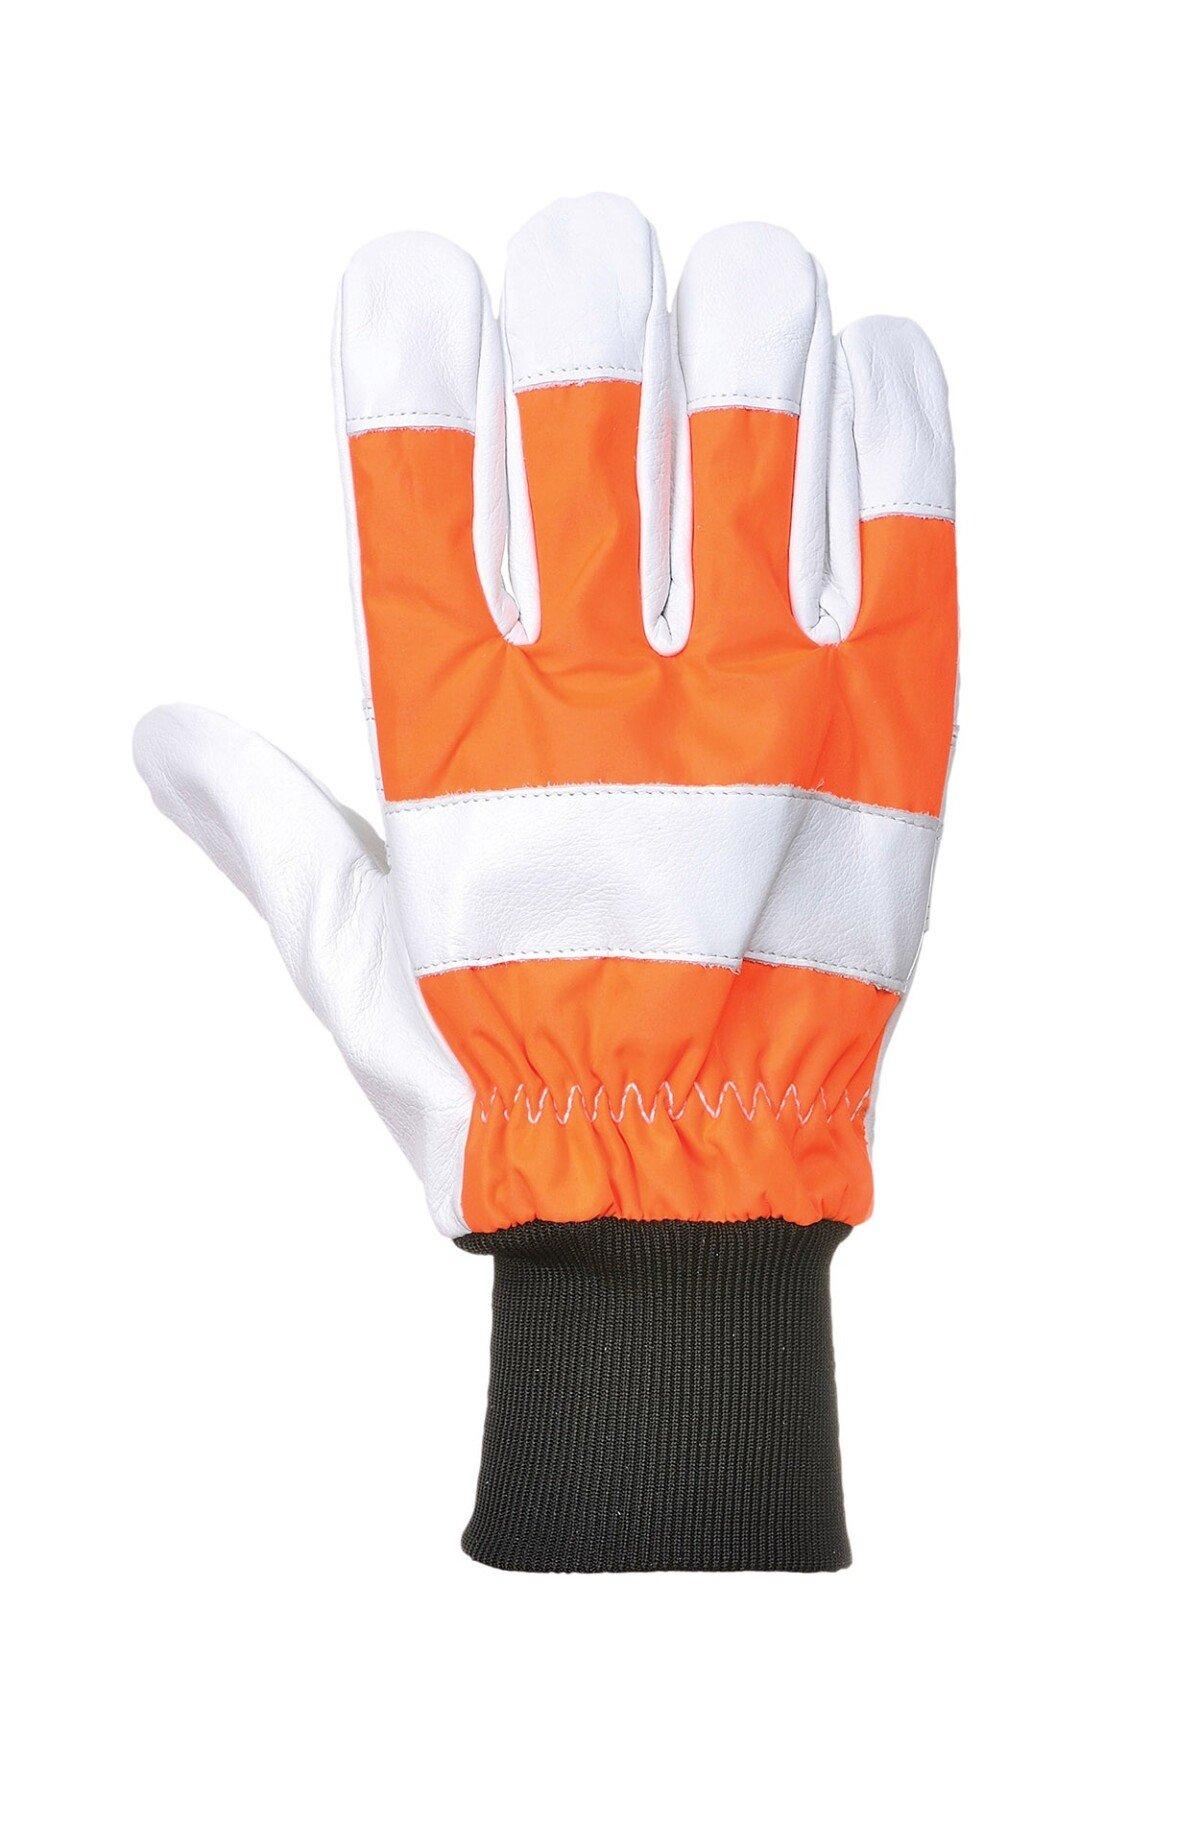 Portwest A290 Oak Chainsaw Protective Glove (Class 0)